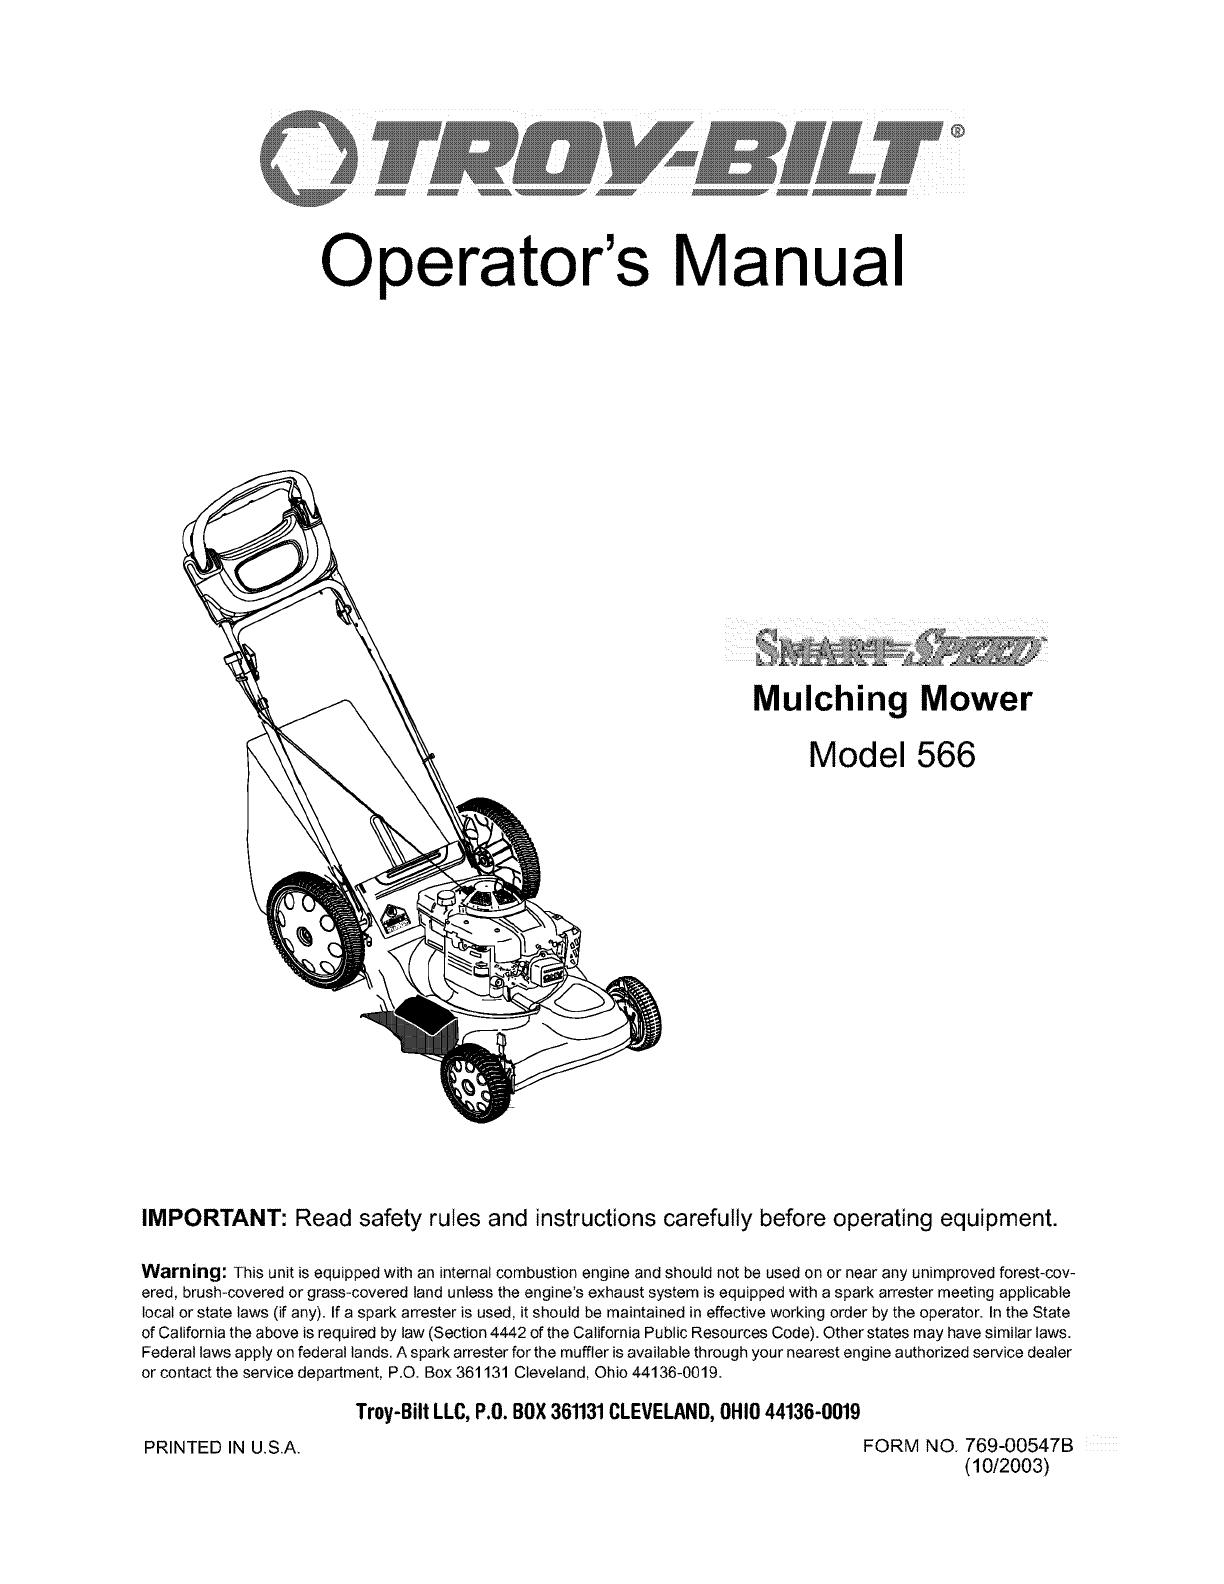 Troybilt 12AD566N711 User Manual LAWN MOWER Manuals And